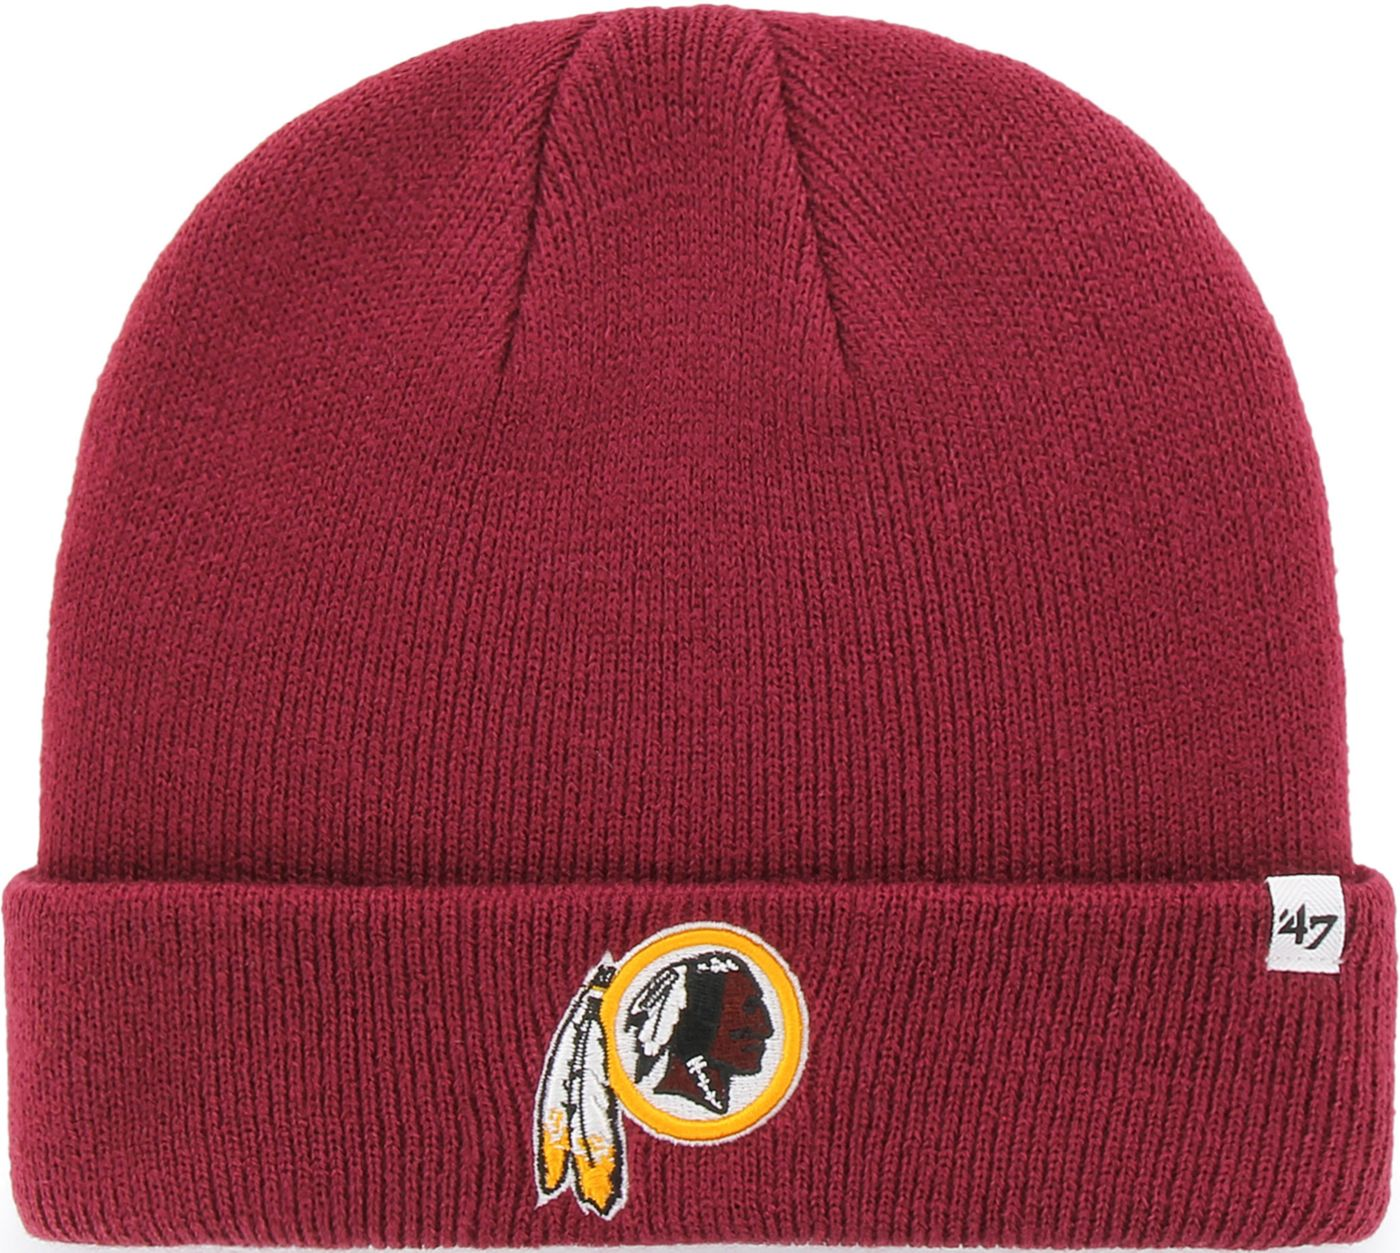 '47 Men's Washington Redskins Basic Cardinal Cuffed Knit Beanie